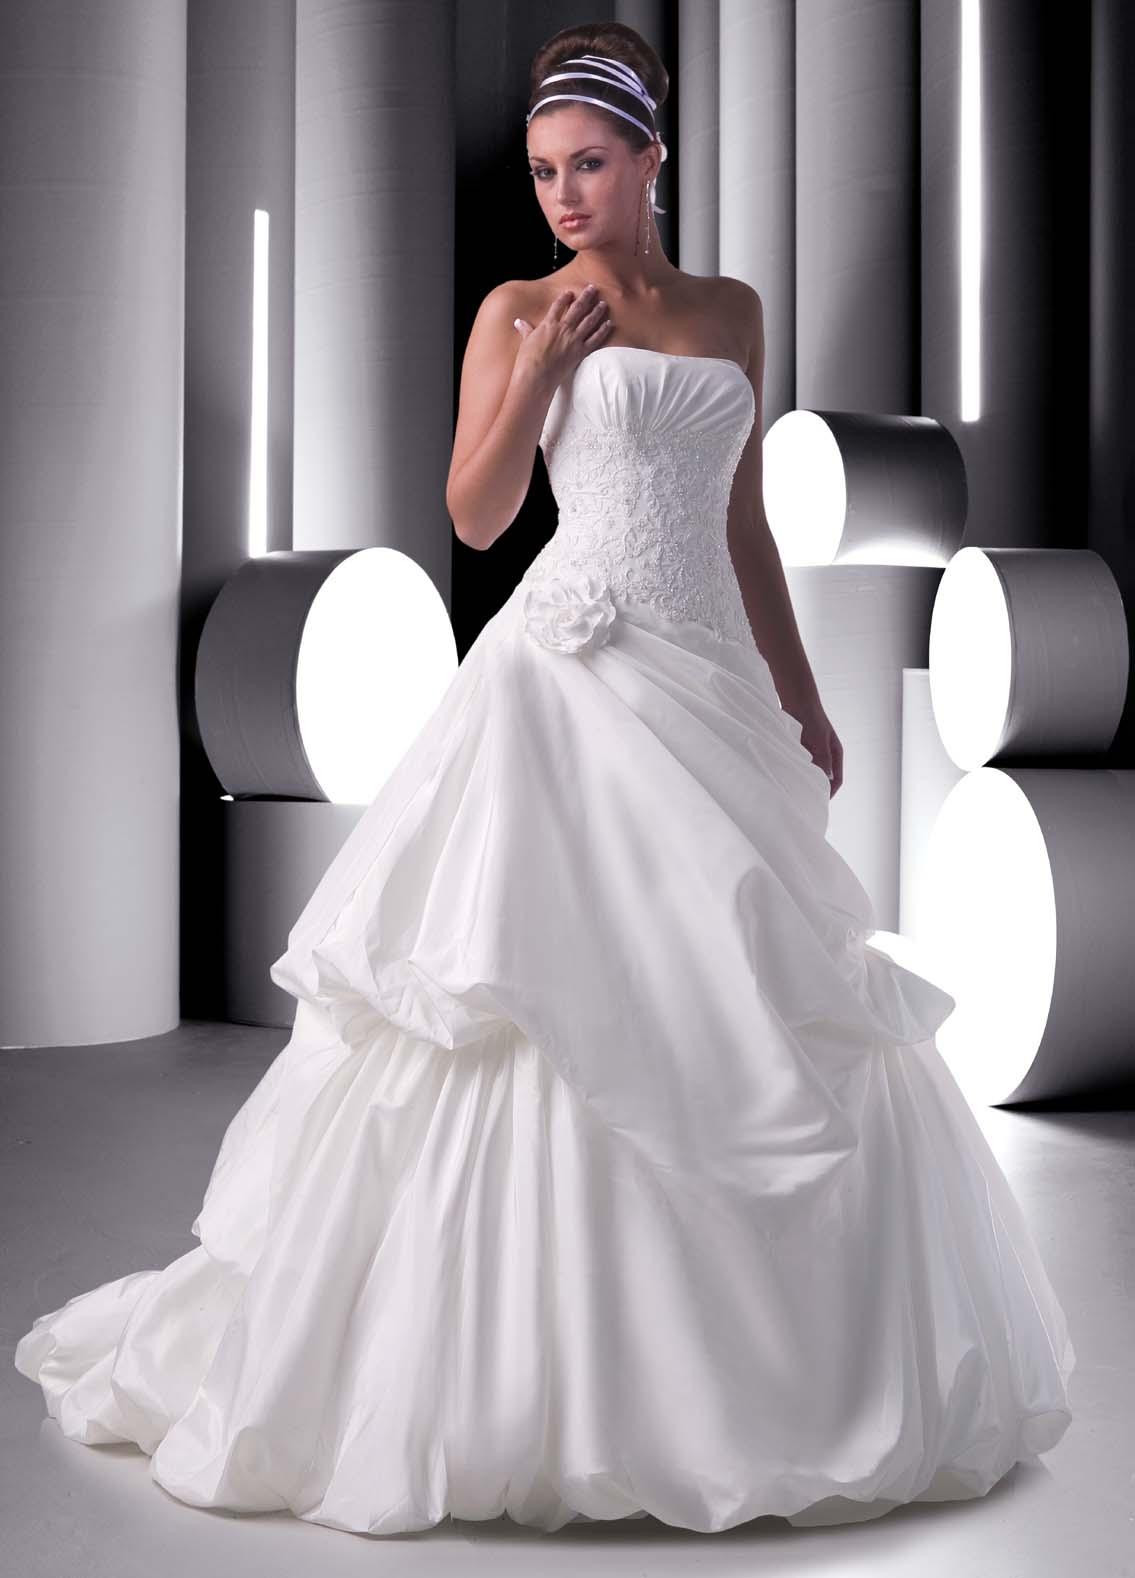 wedding gown index wedding gown wedding gowns under